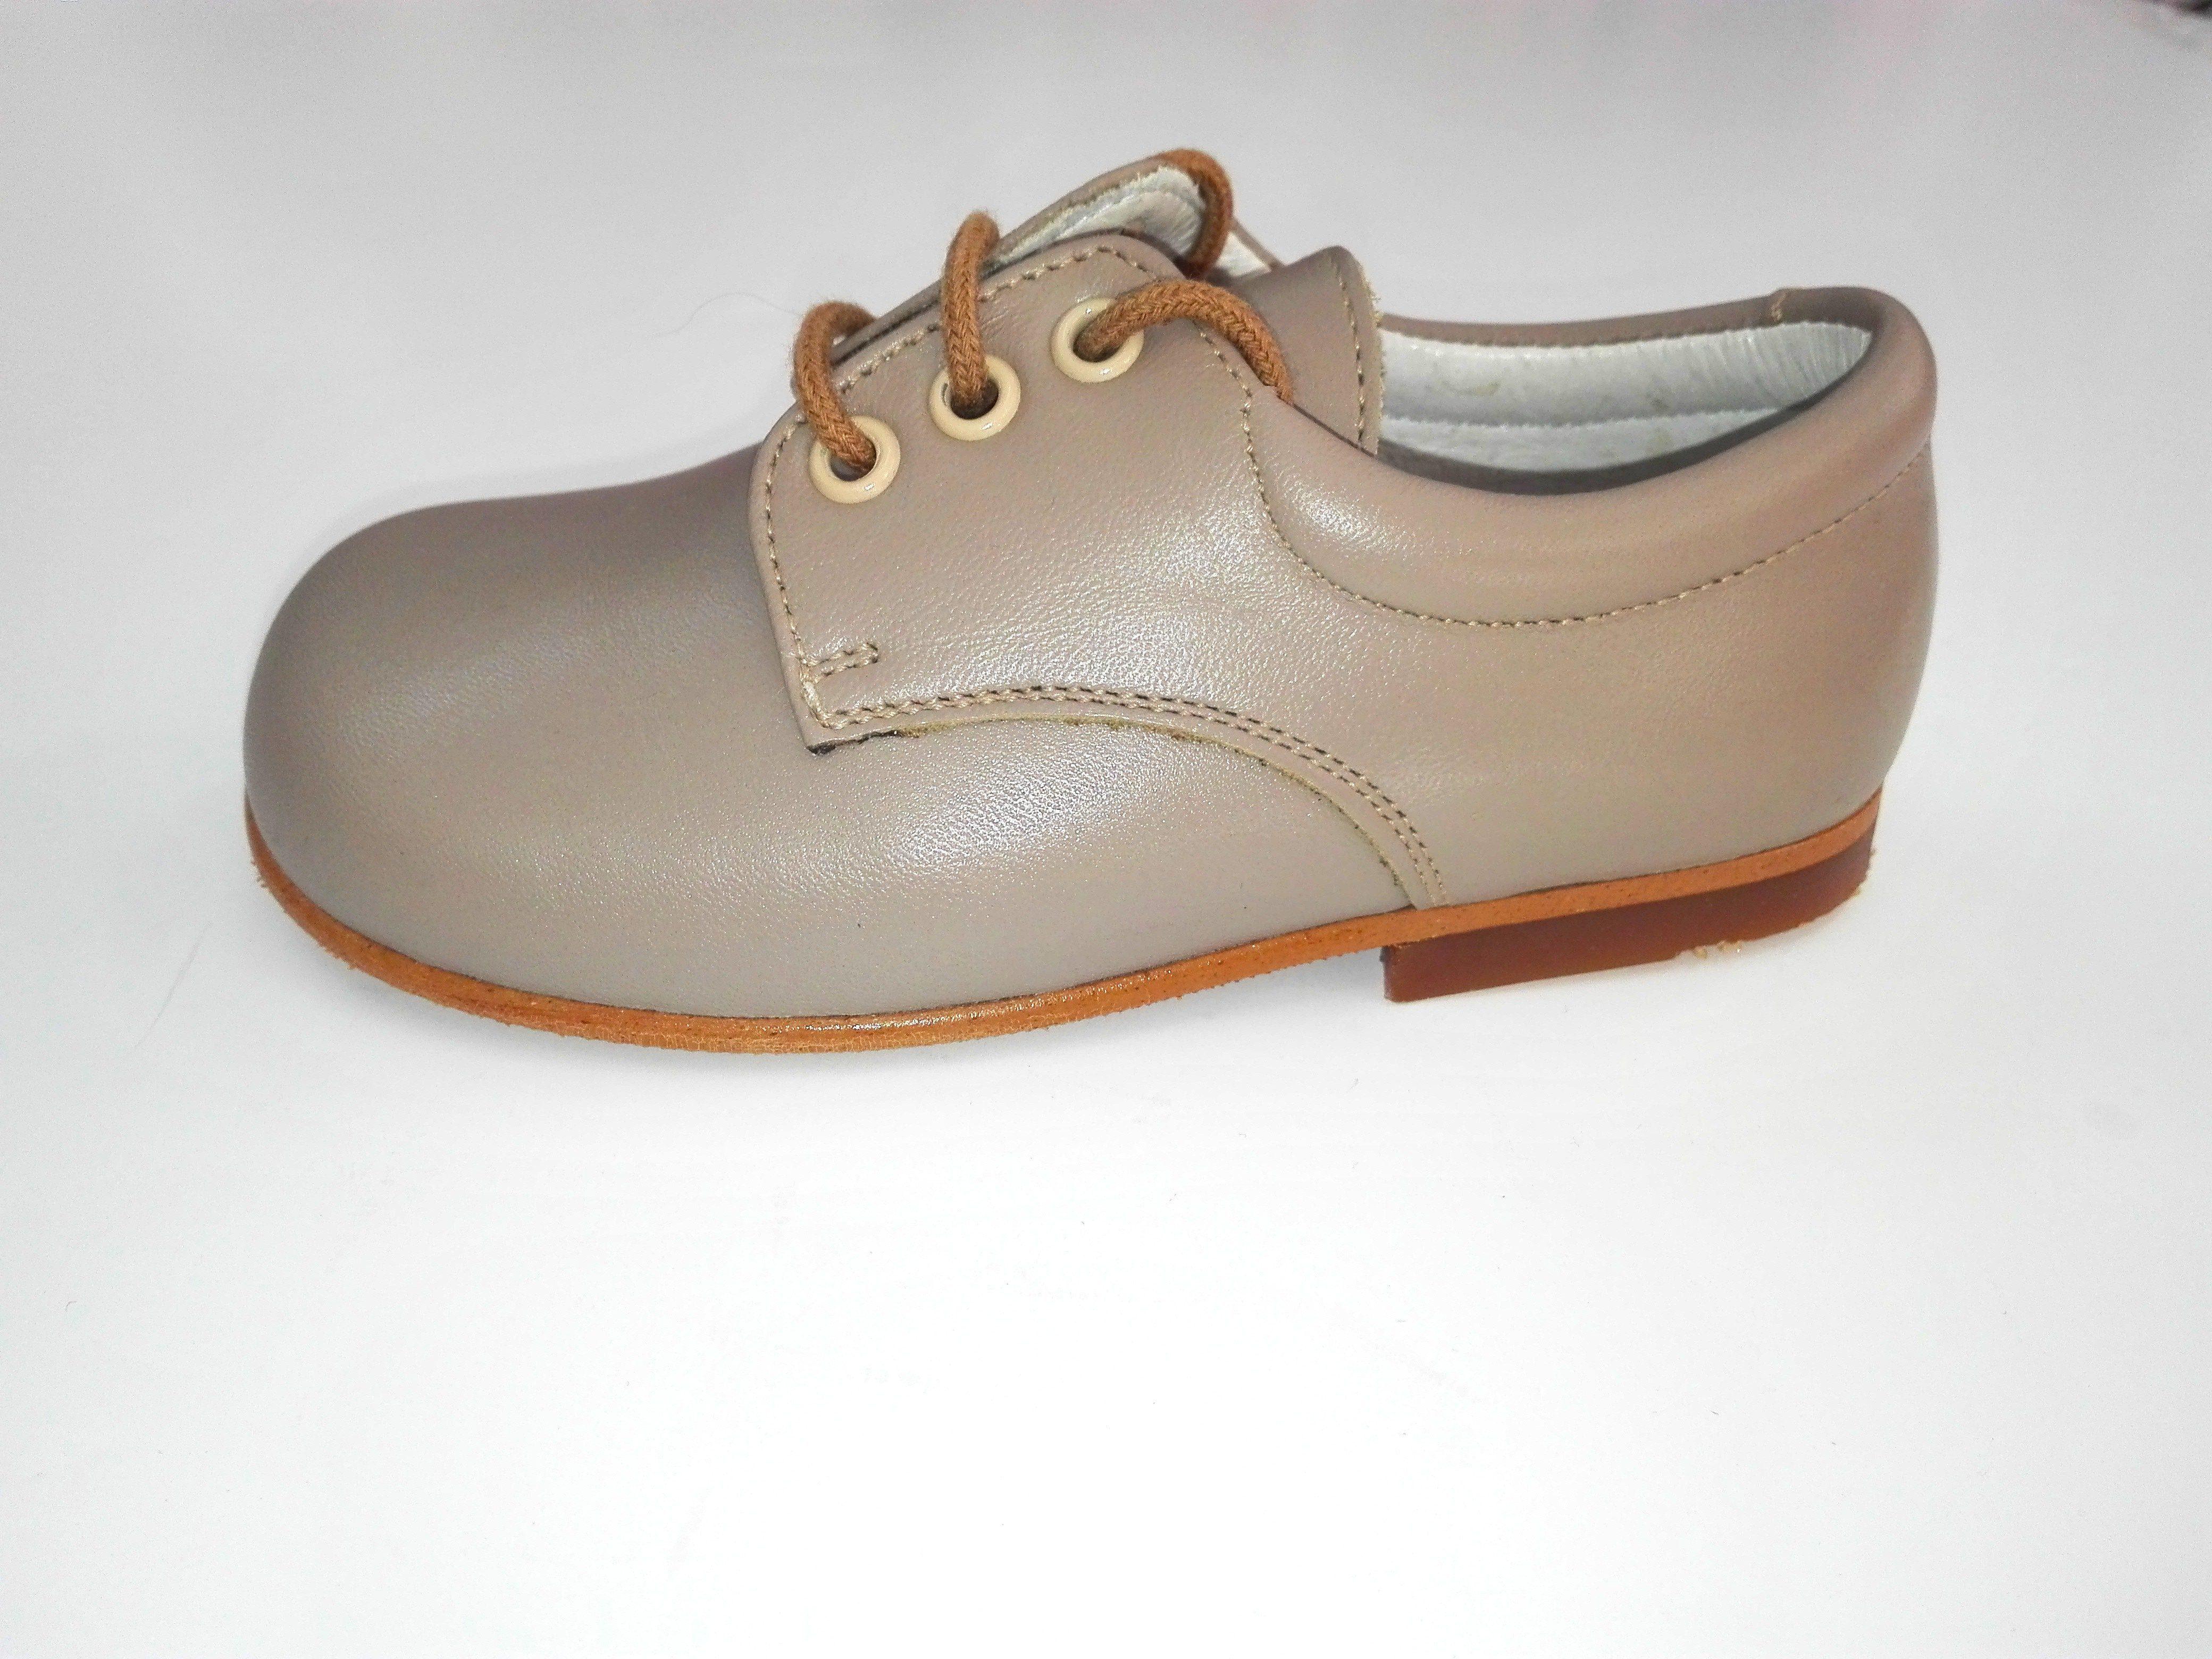 5c2437f2e Zapato cordón PIEL VISÓN - Arca Boutique Infantil-Juvenil